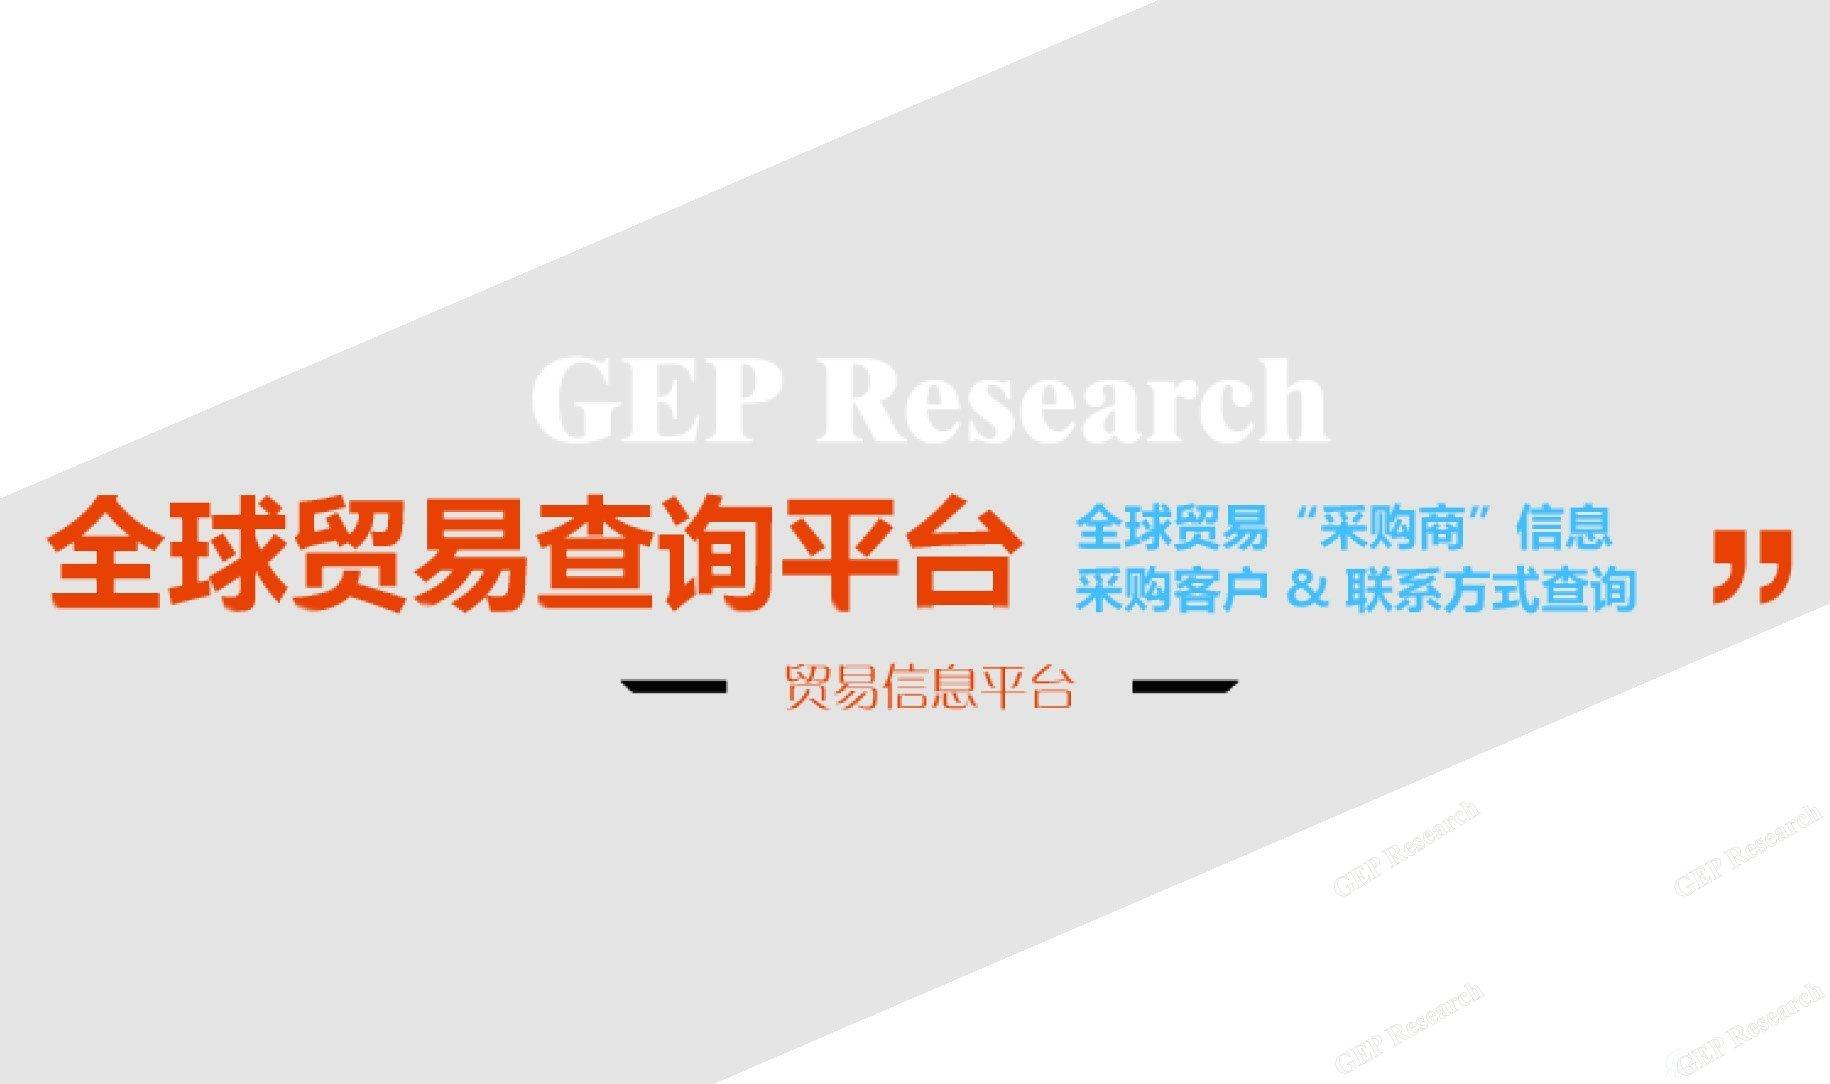 GEP Research全球进出口贸易平台